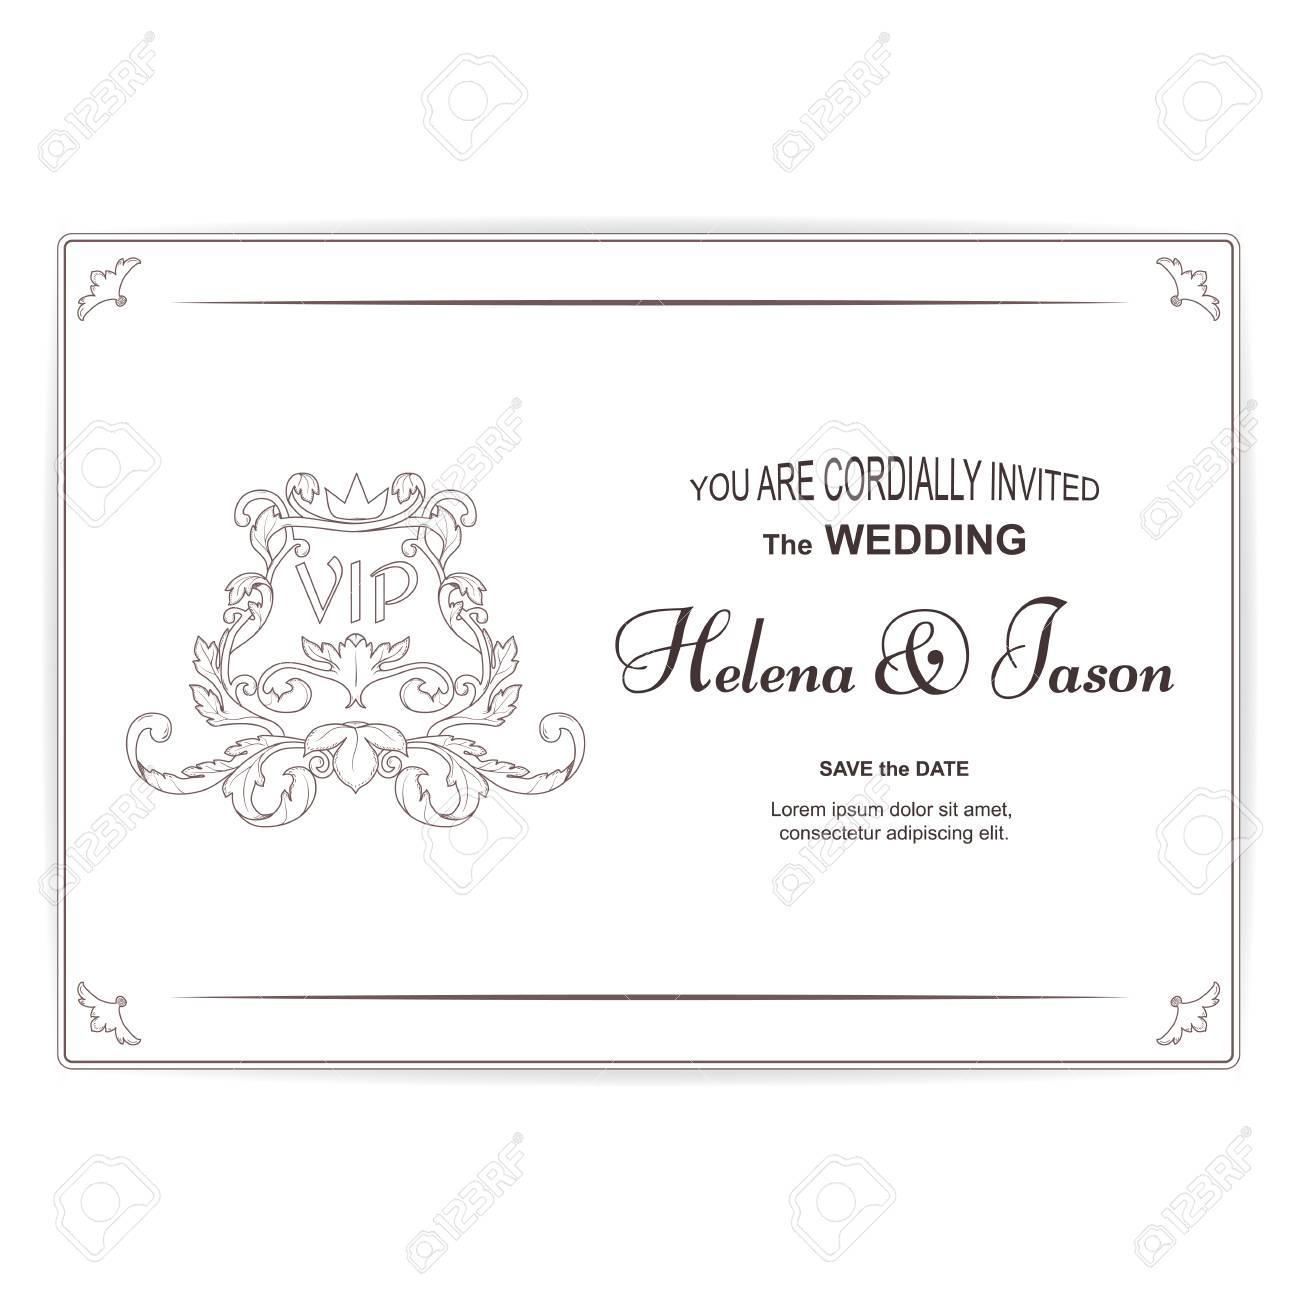 Elegant Horizontal Vintage White Postcard For The Wedding Invitation ...